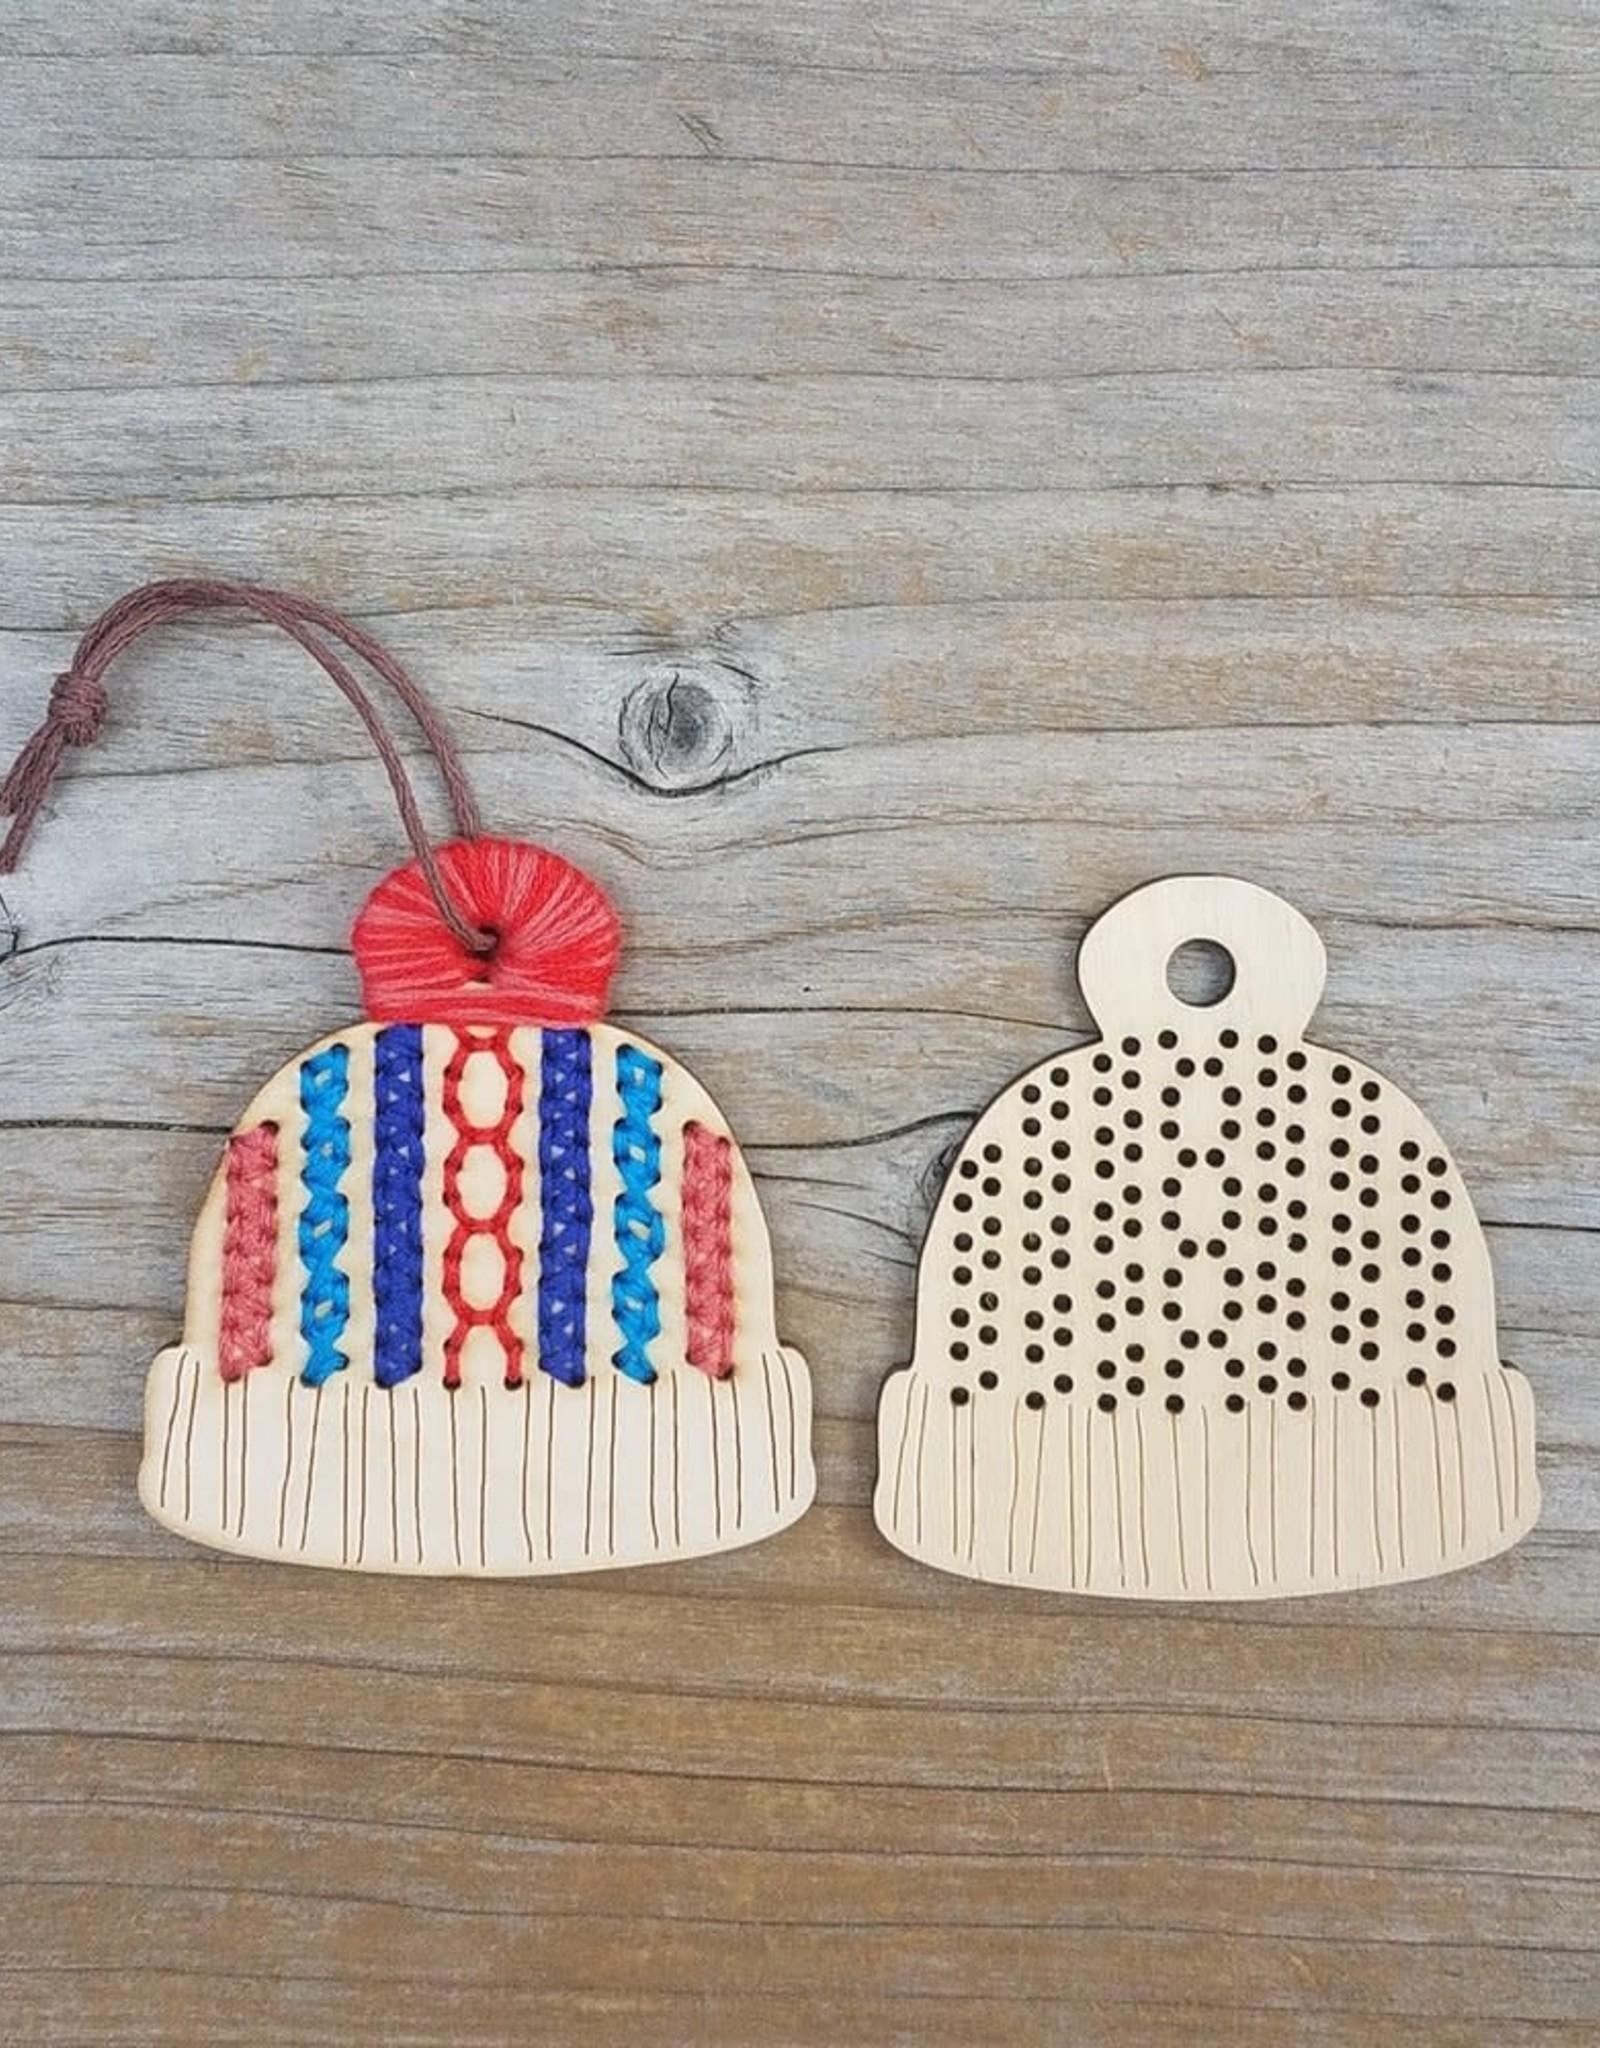 Katrinkles Katrinkles Hat Ornament Kit